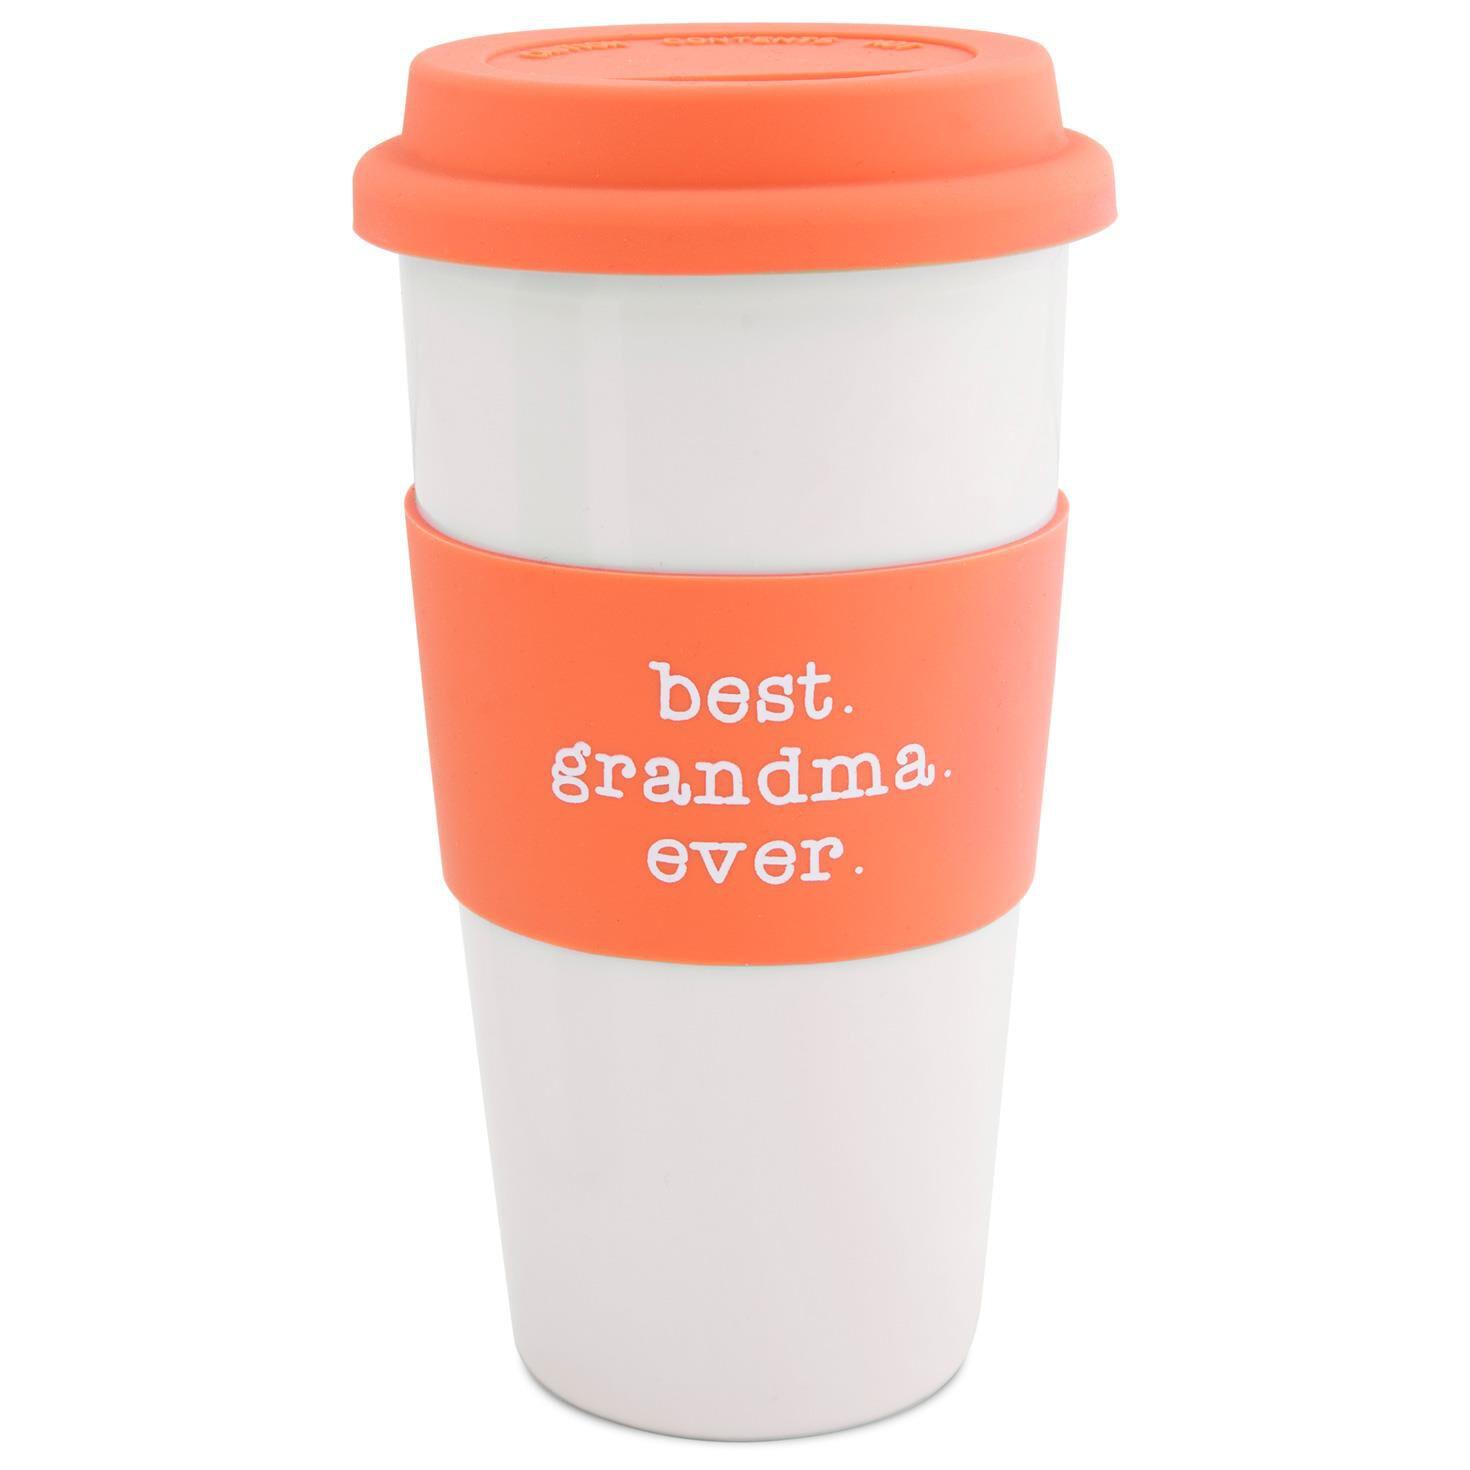 best grandma ever insulated travel mug 15 oz large - Coffee Travel Mugs